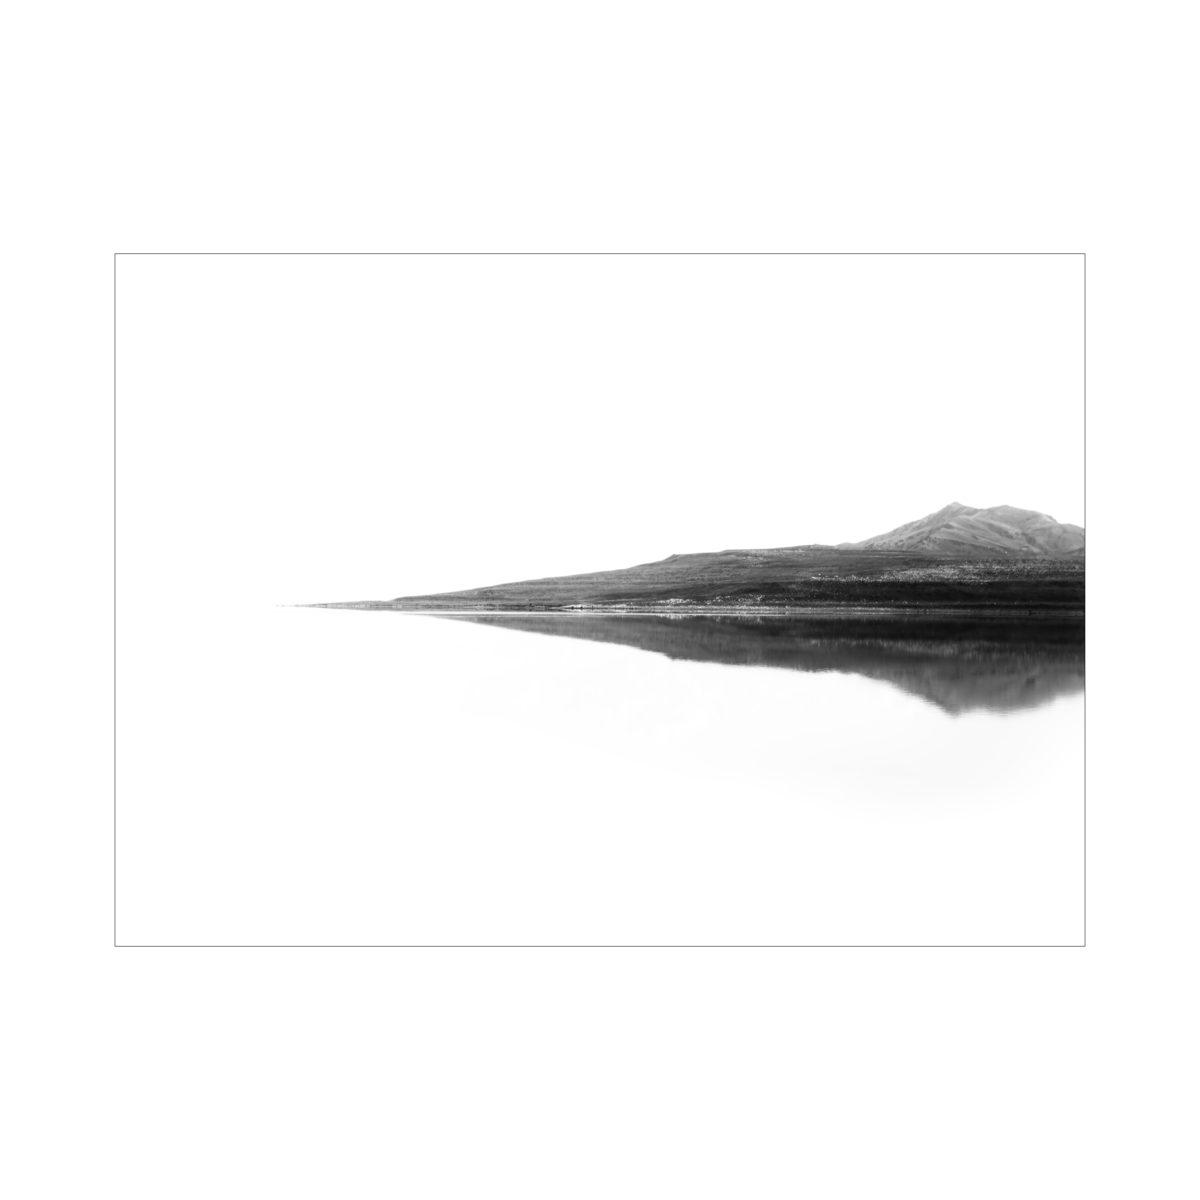 TroelsFrandsen_01_7X5_Horizontal